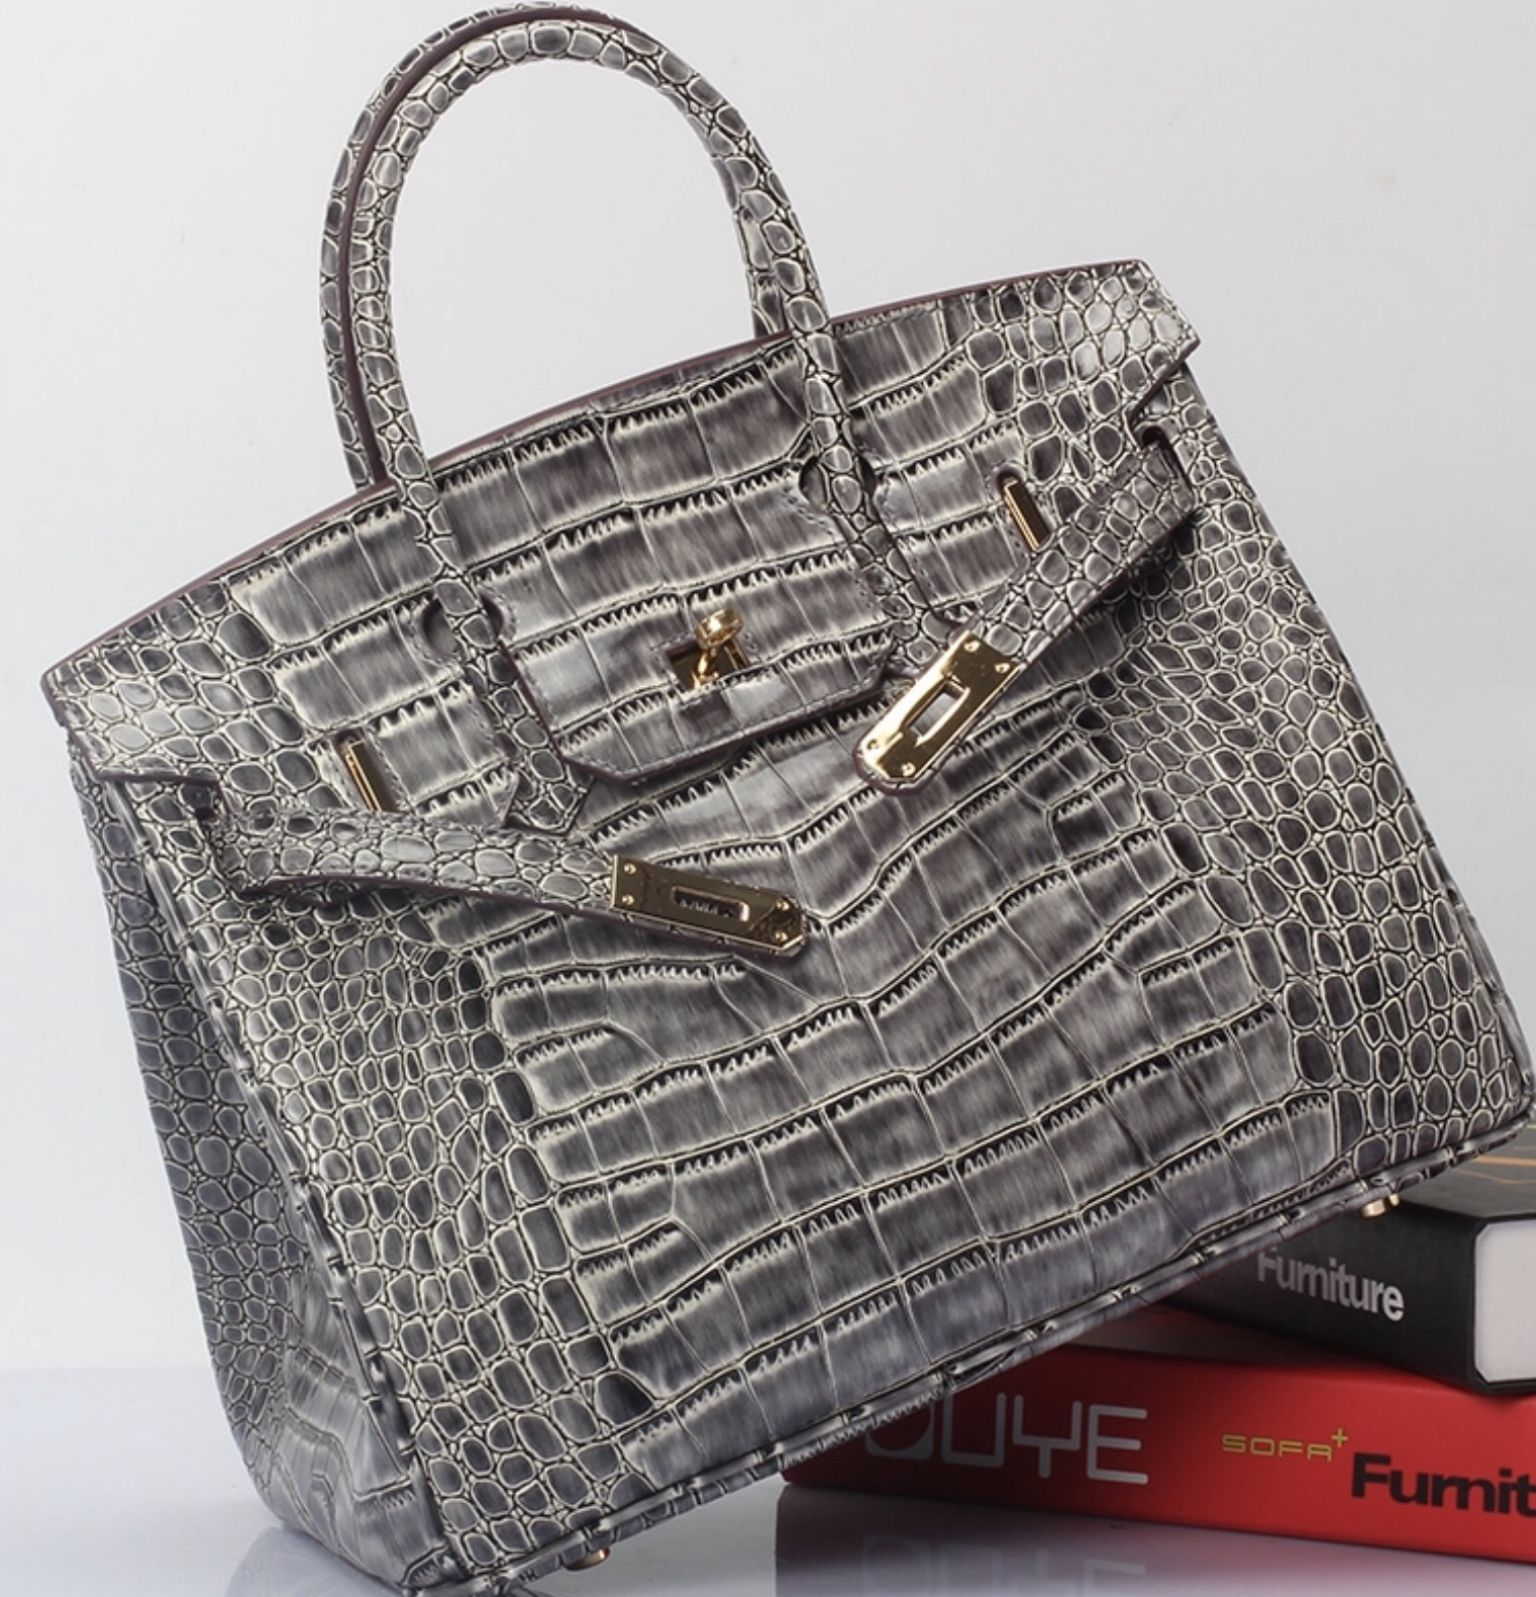 25cm Crocodile Embossed Italian Leather Birkin Style Satchel Handbag 1632S